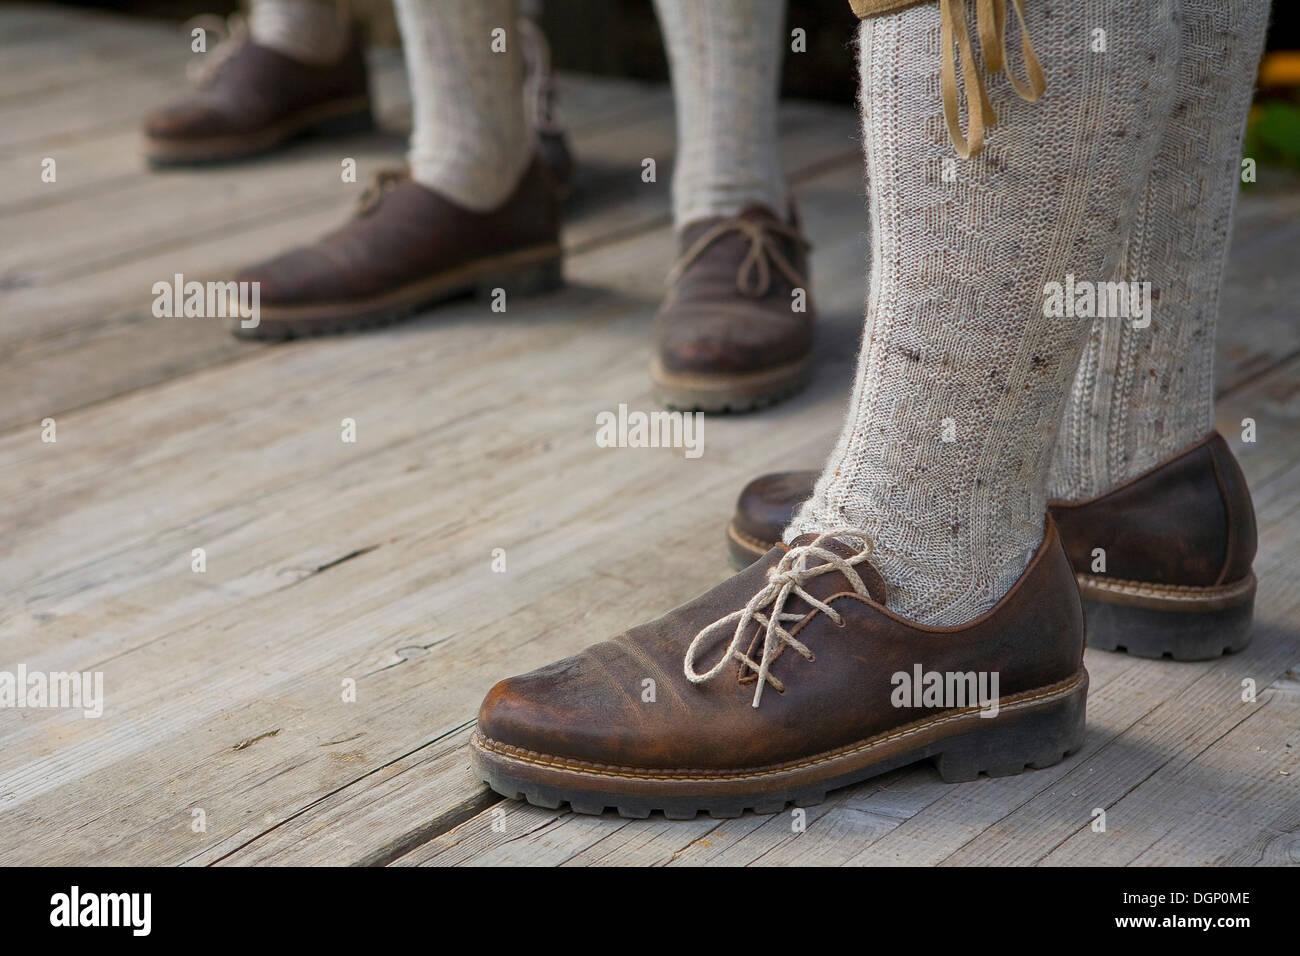 Traje tradicional tirolés, el detalle de los pies, el Tirol del Sur, Italia, Europa Foto de stock